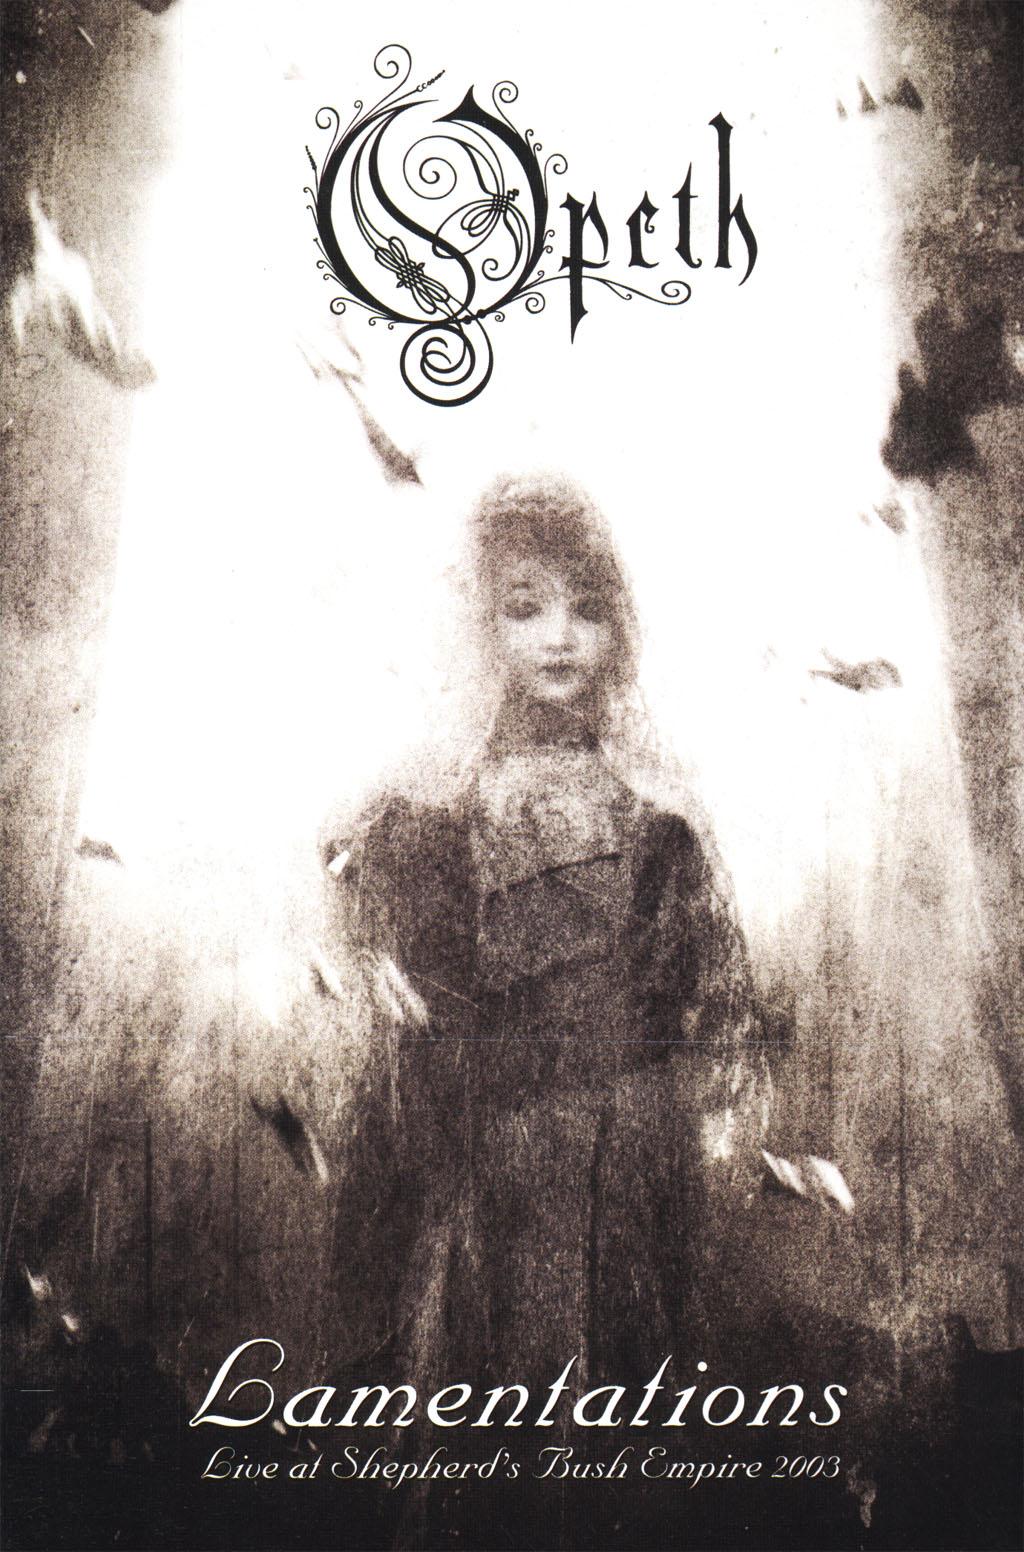 OPETH - Lamentations, Live At Shepherd's Bush Empire, 2003 cover